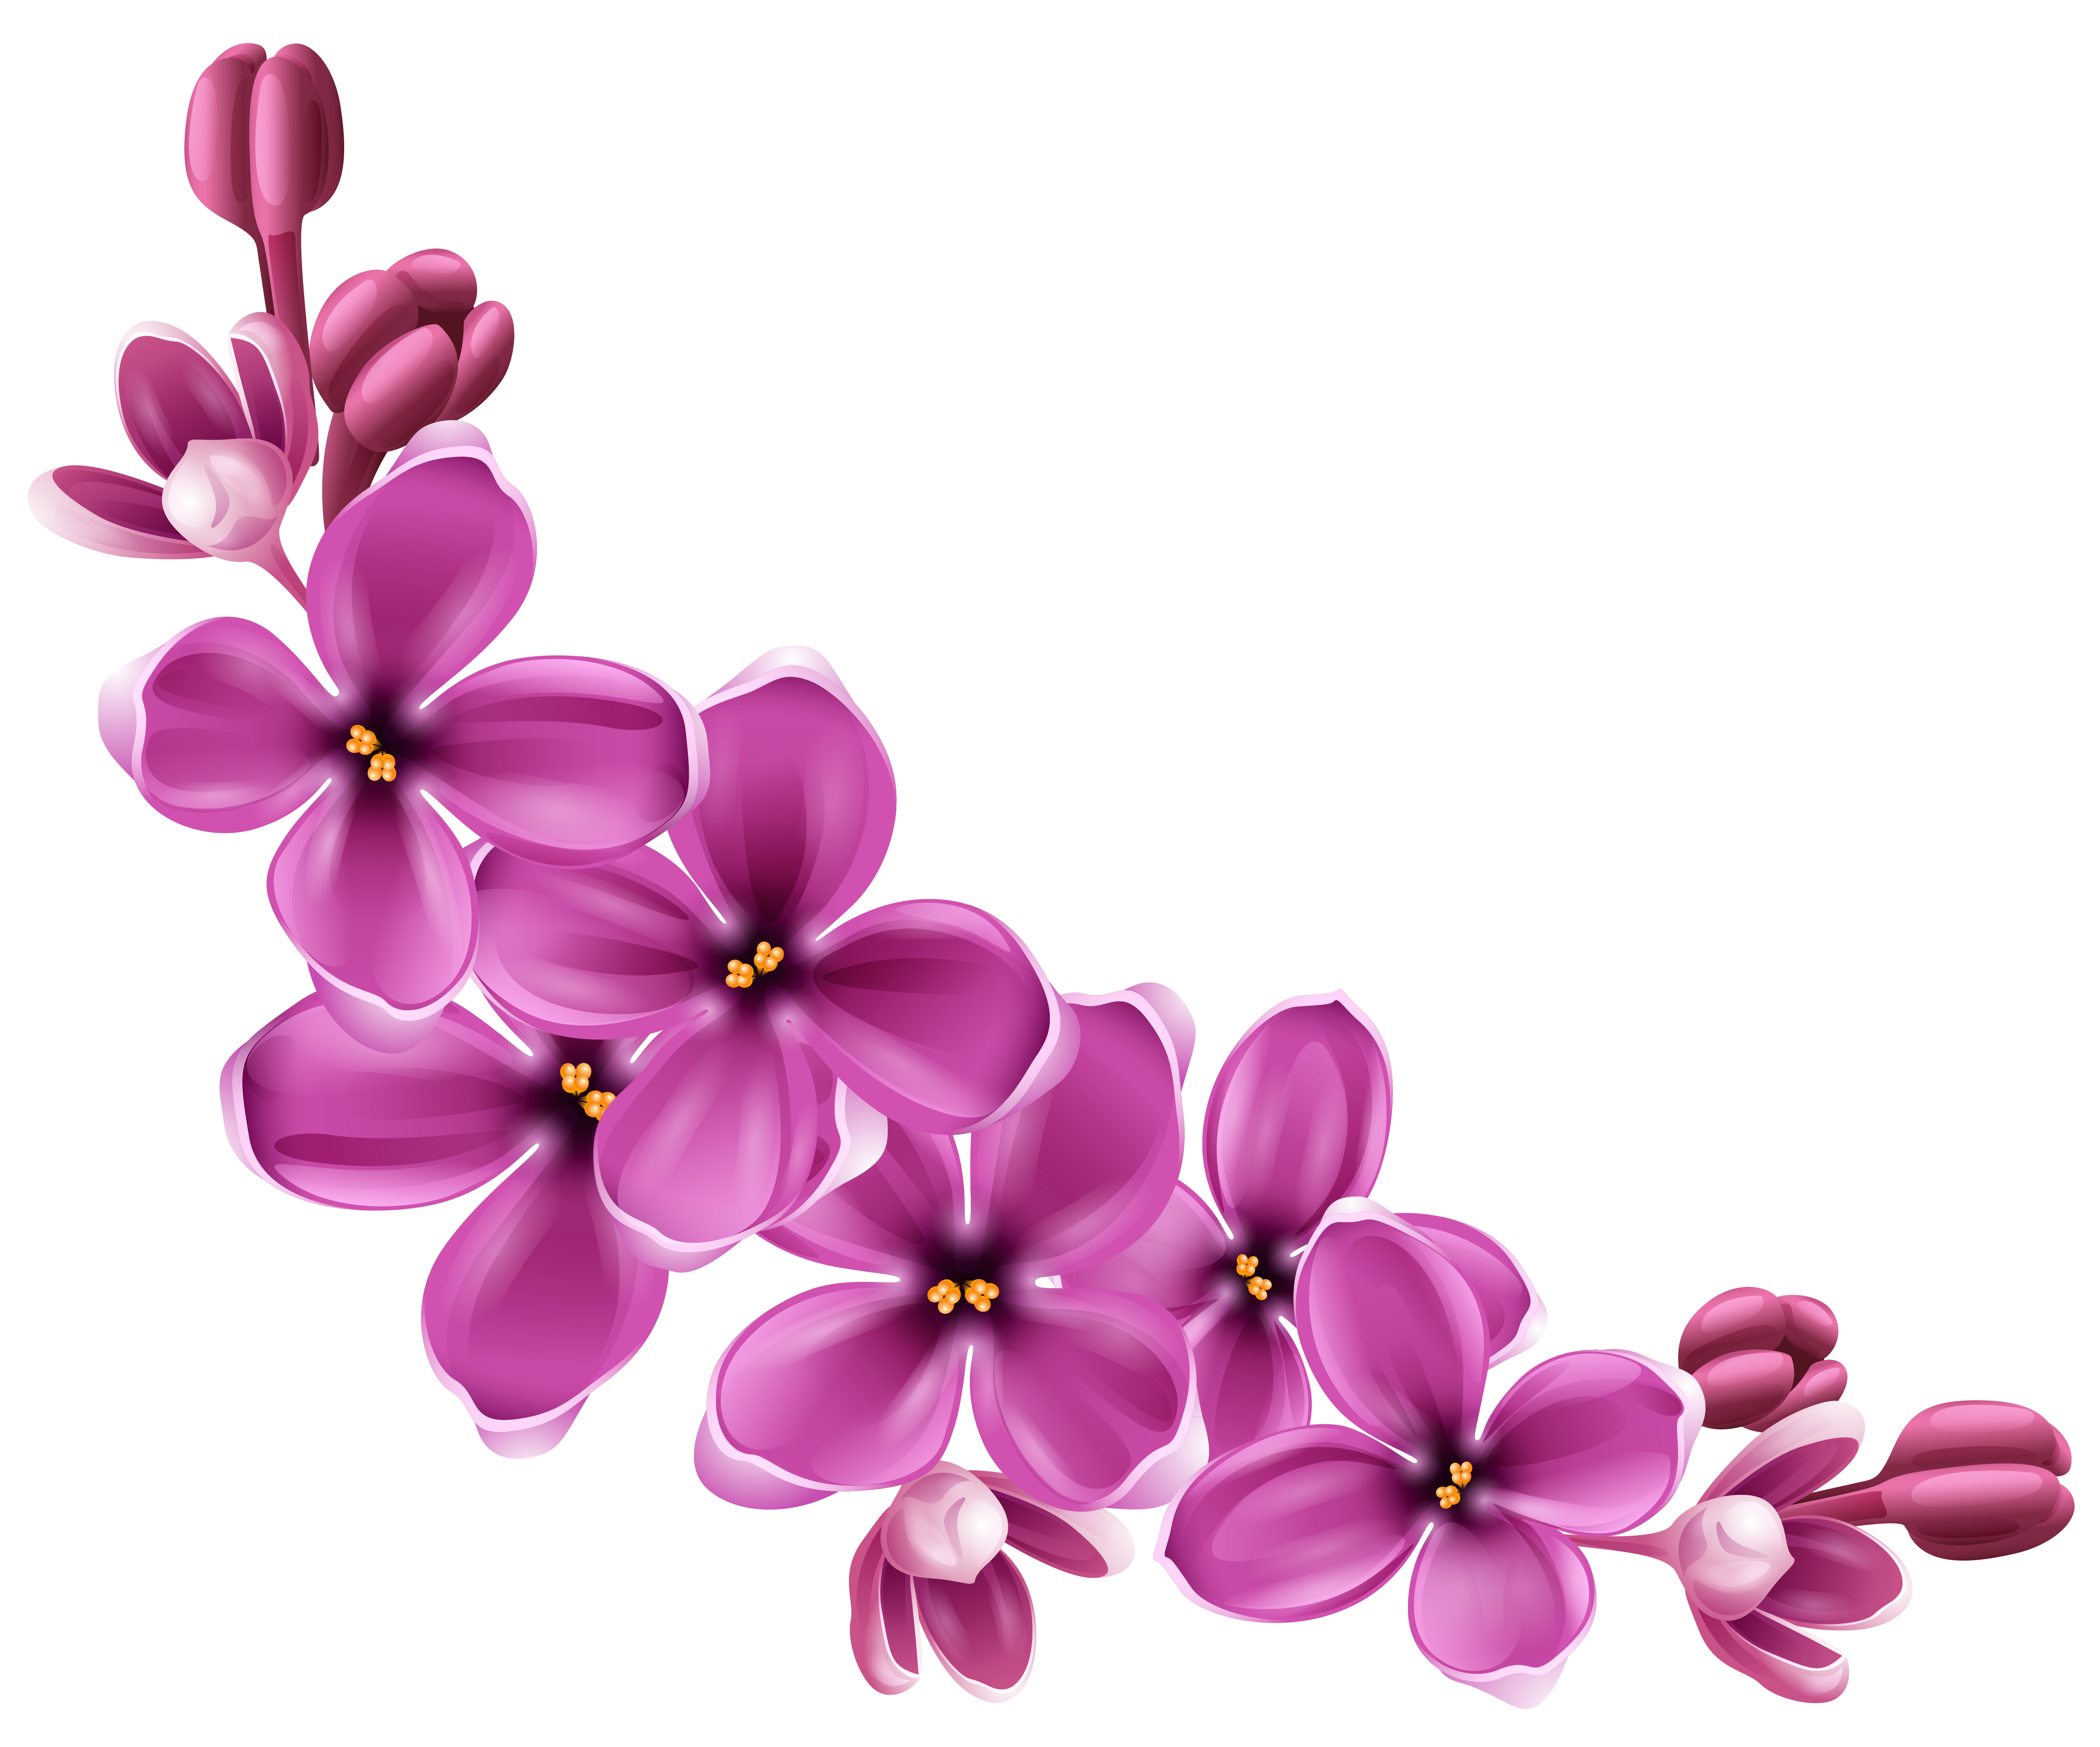 download flowers png 9 hq png image freepngimg free elephant clipart images free elephant clipart images